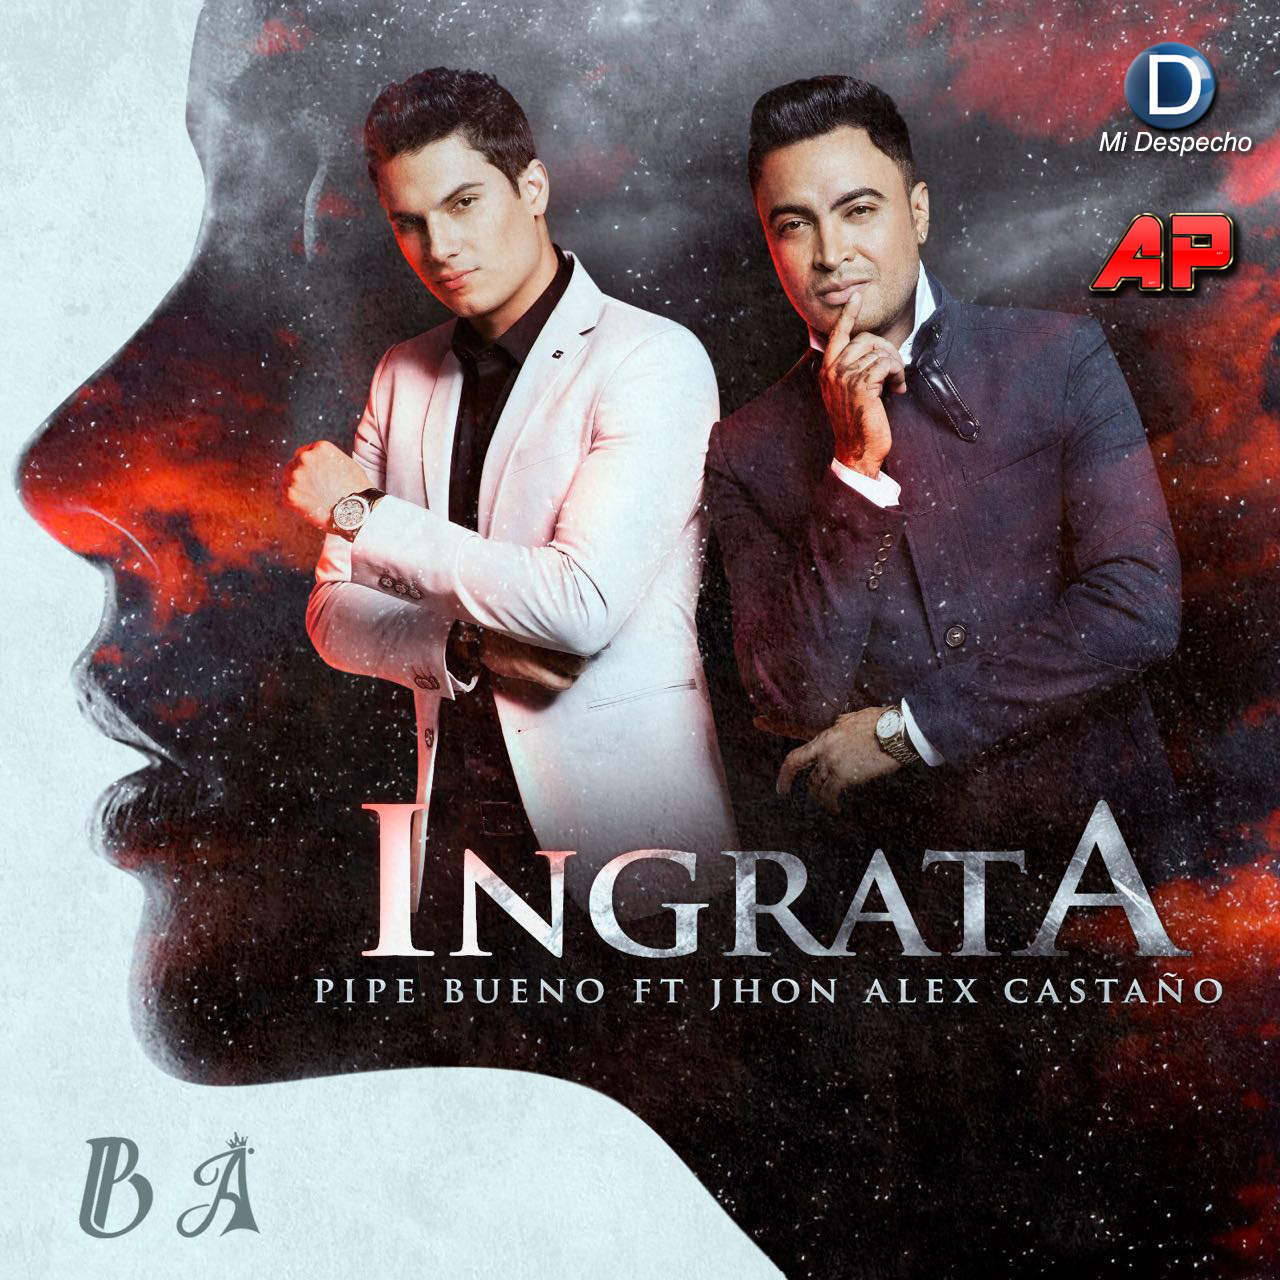 Pipe Bueno & Jhon Alex Castaño Ingrata